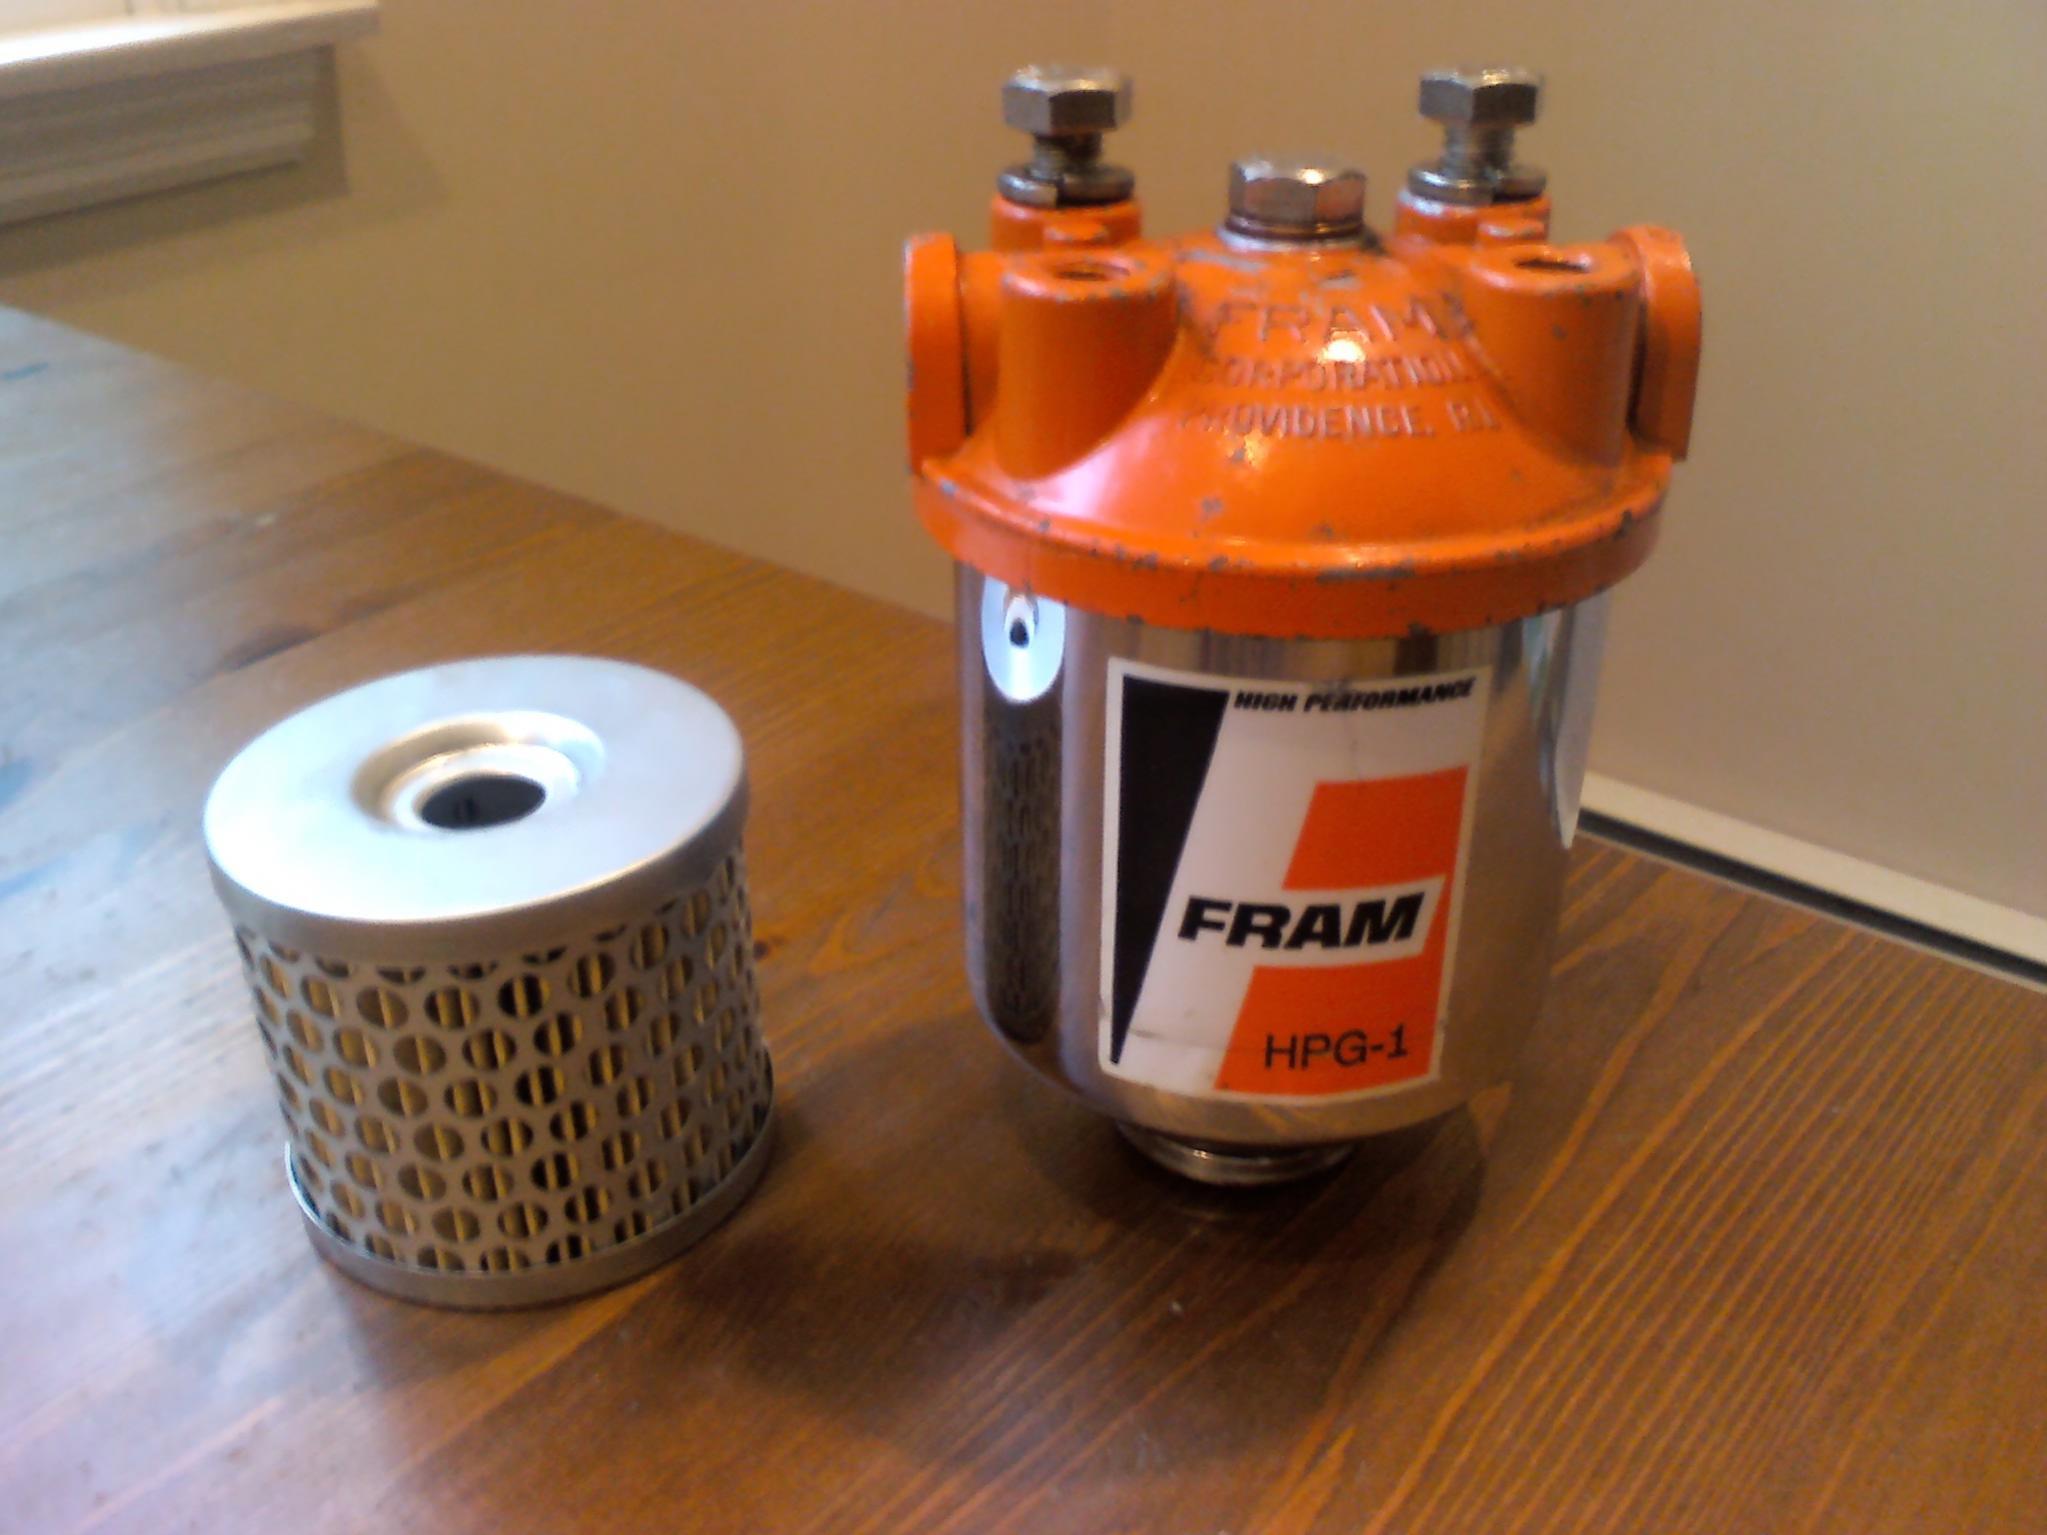 [SCHEMATICS_48YU]  For Sale: - Holley Blue Fuel Pump, Fram HPG-1 Fuel Filter | Factory Five  Racing Forum | Fram Hpg1 Fuel Filter |  | Factory Five Racing Forum